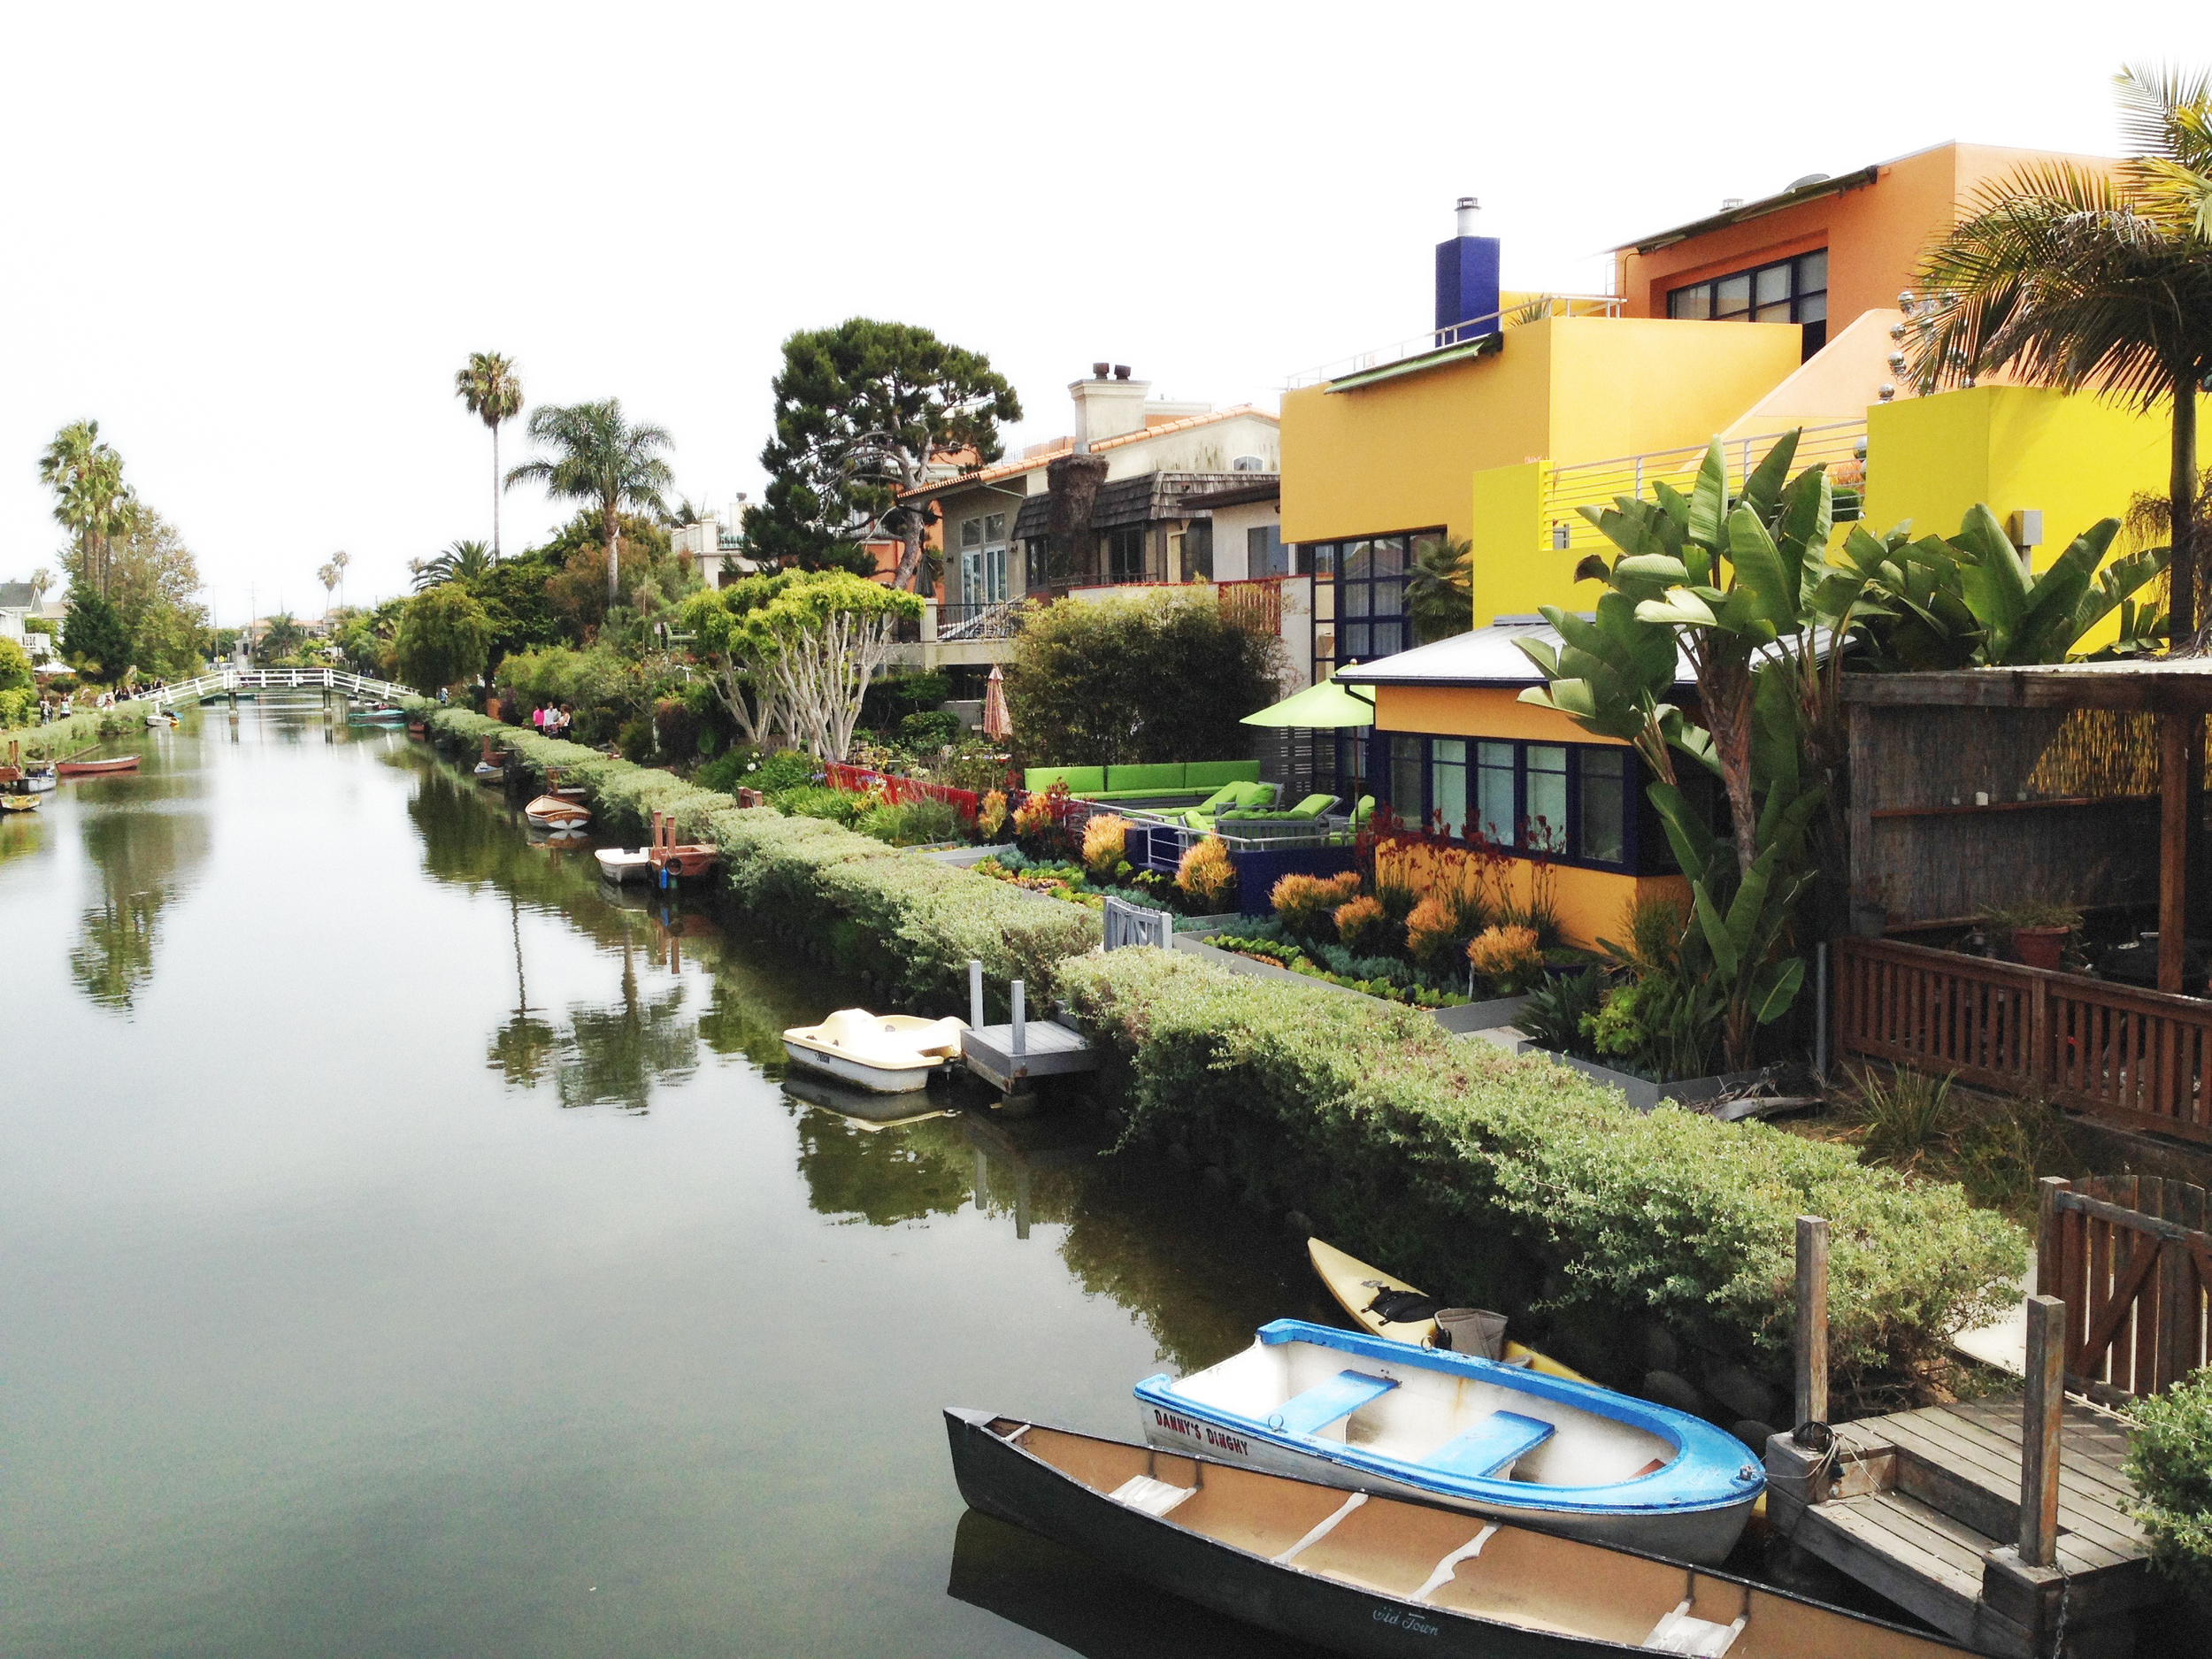 Venice Beach Canals  Venice Beach, Los Angeles, California,VHS 2015